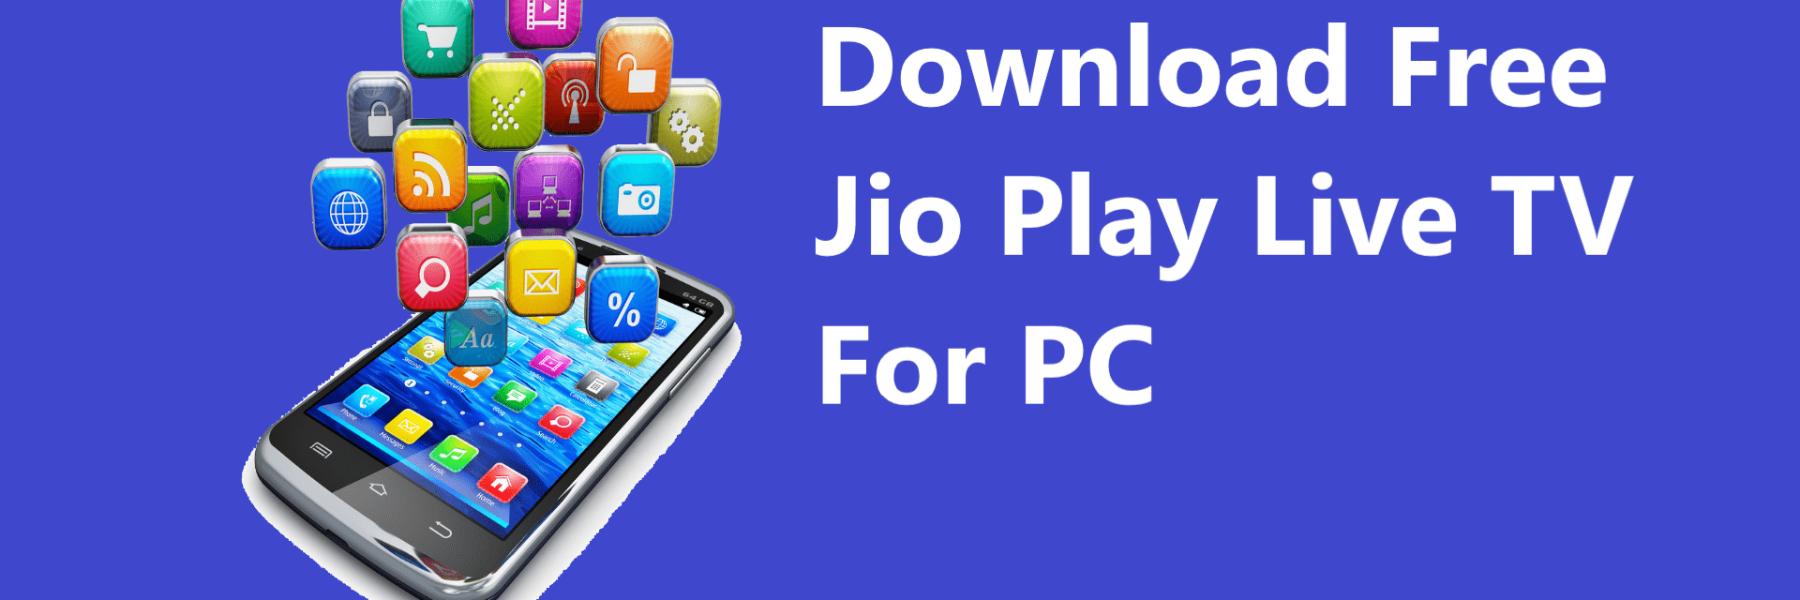 Jio Play Live TV